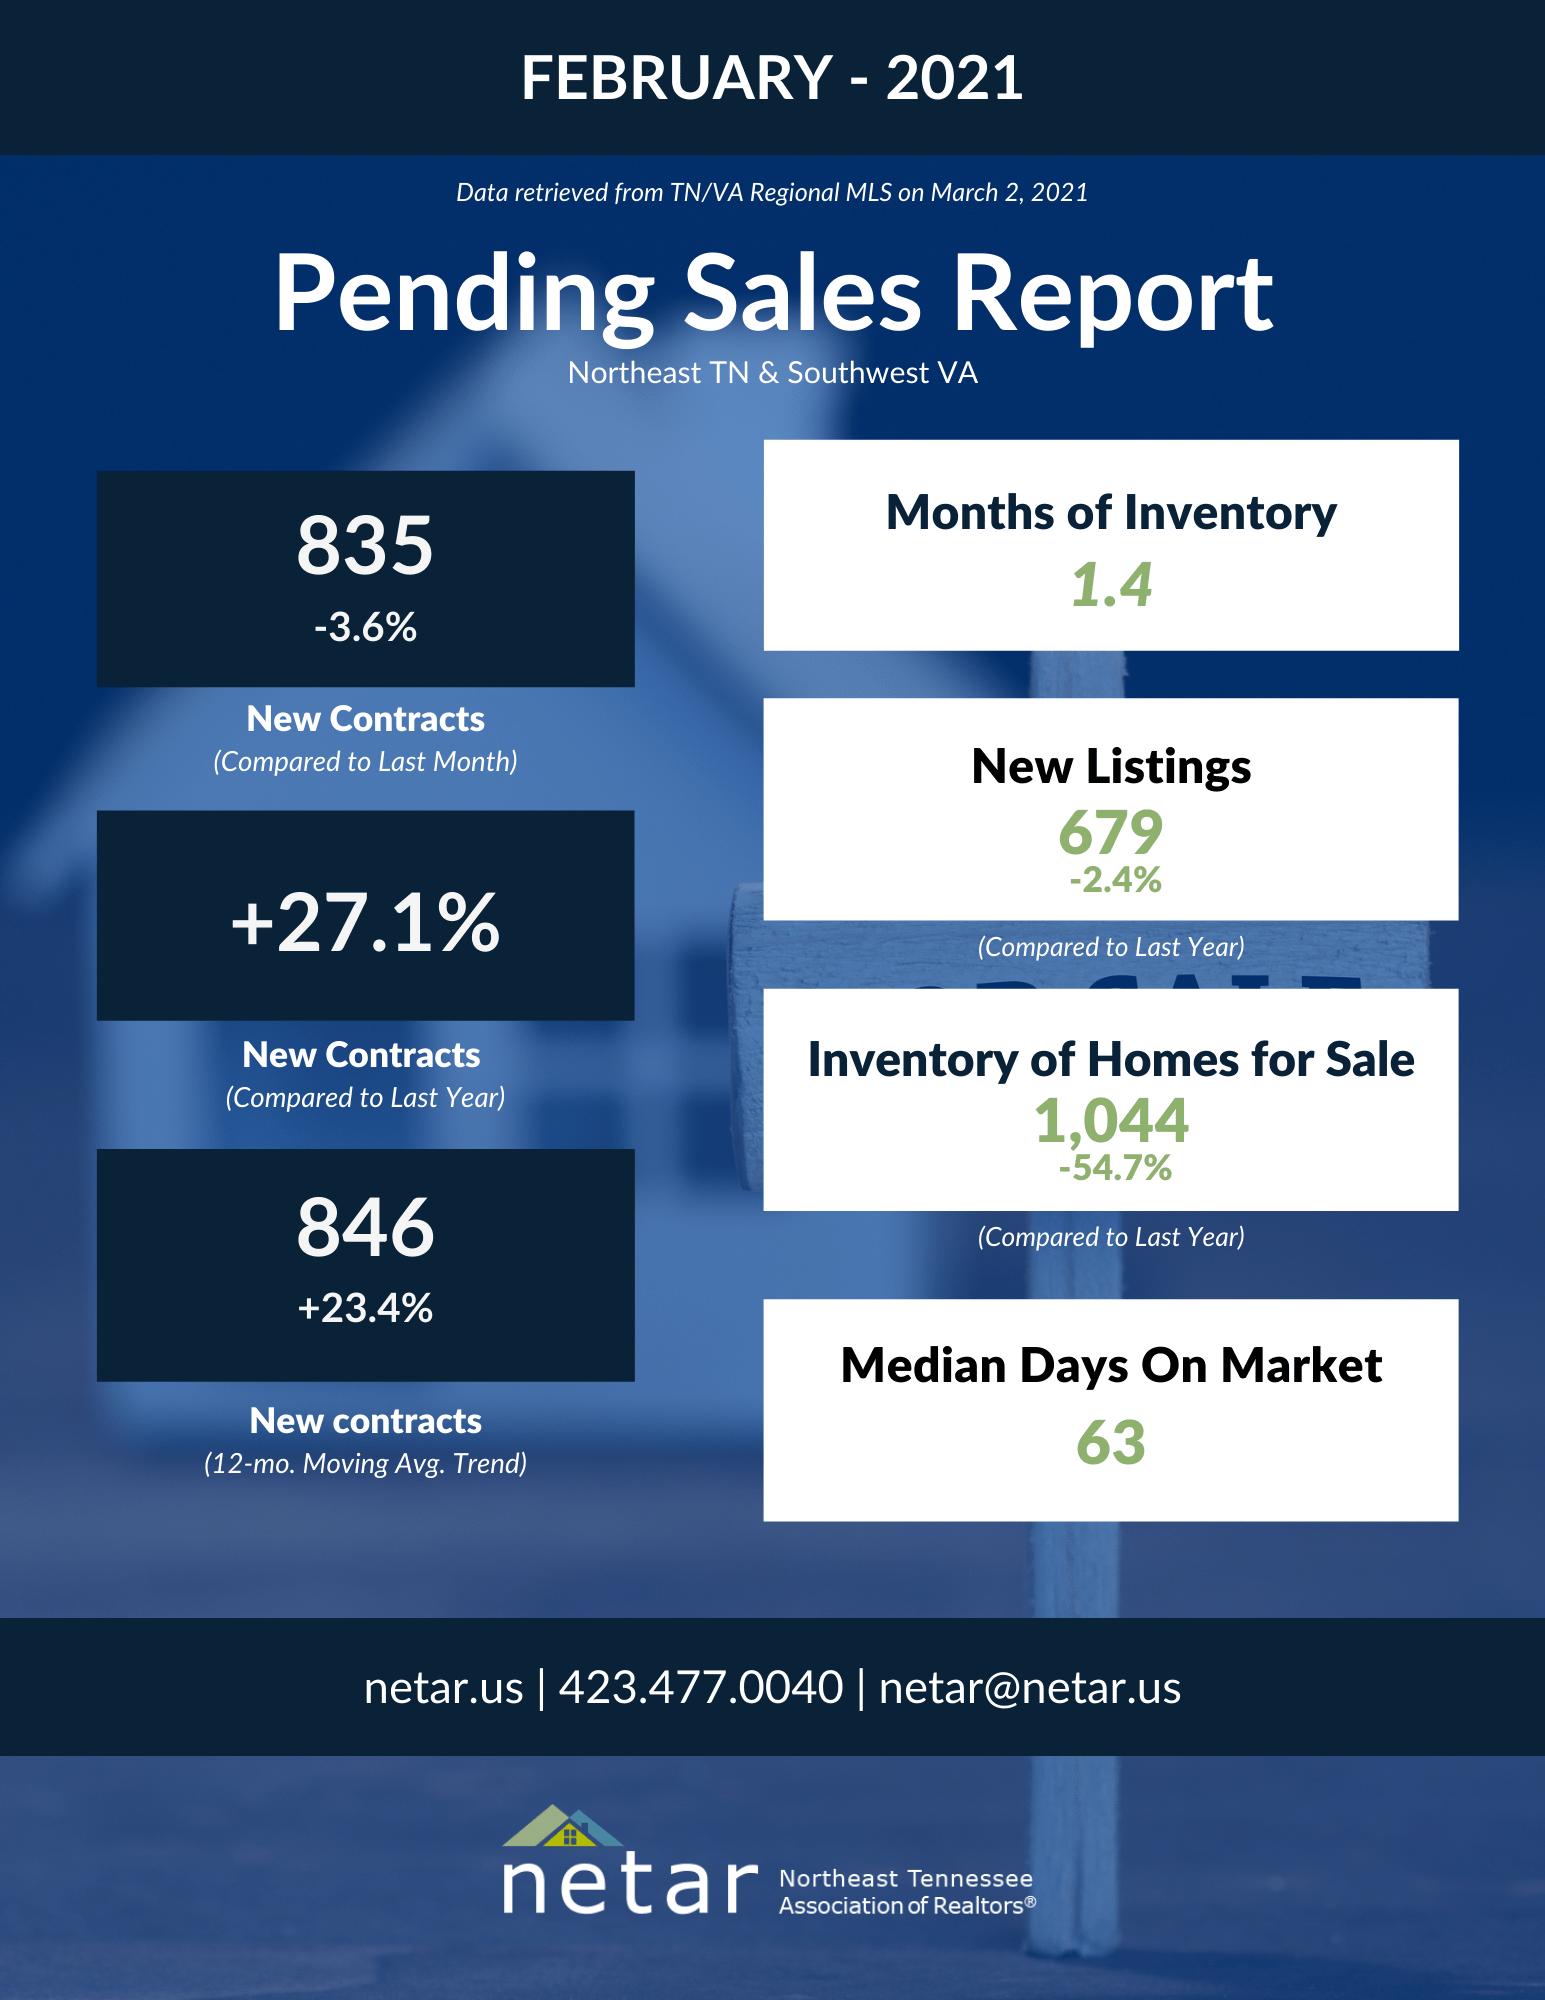 Feb 2021 Pending Sales